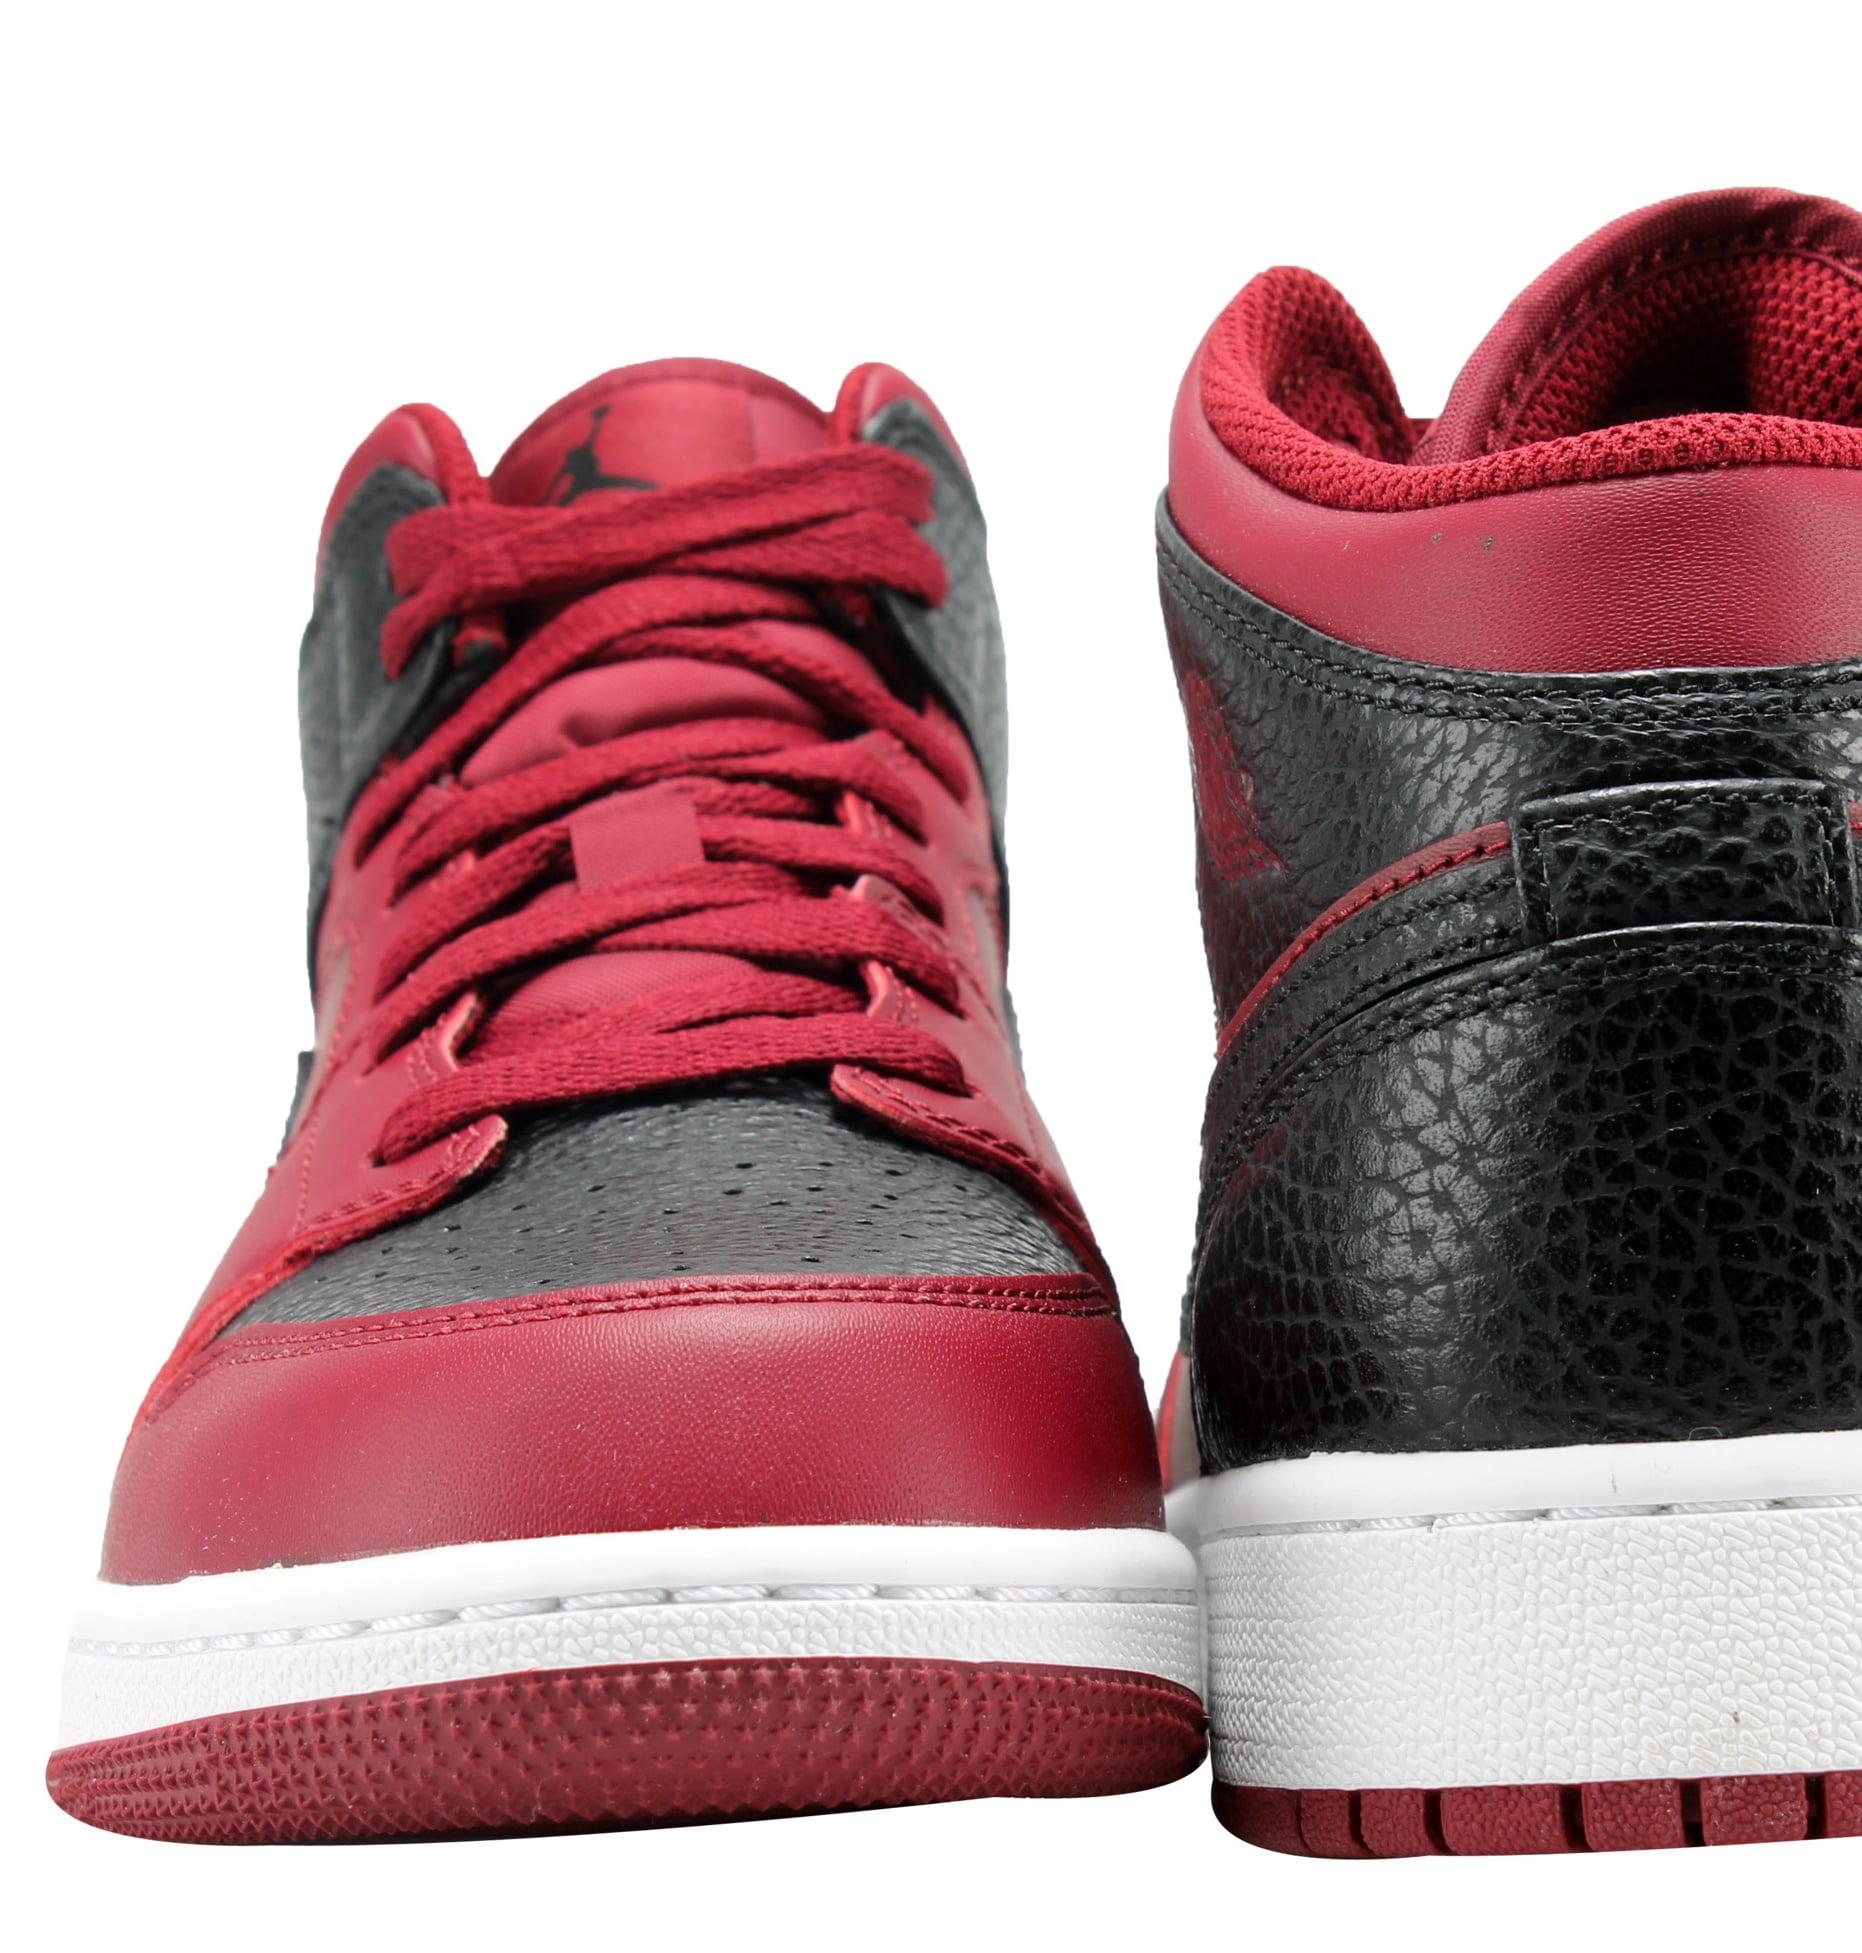 58ca5386a4fb8e Jordan - Nike Air Jordan 1 Mid Team Red Black-White Men s Basketball Shoes  554724-601 - Walmart.com